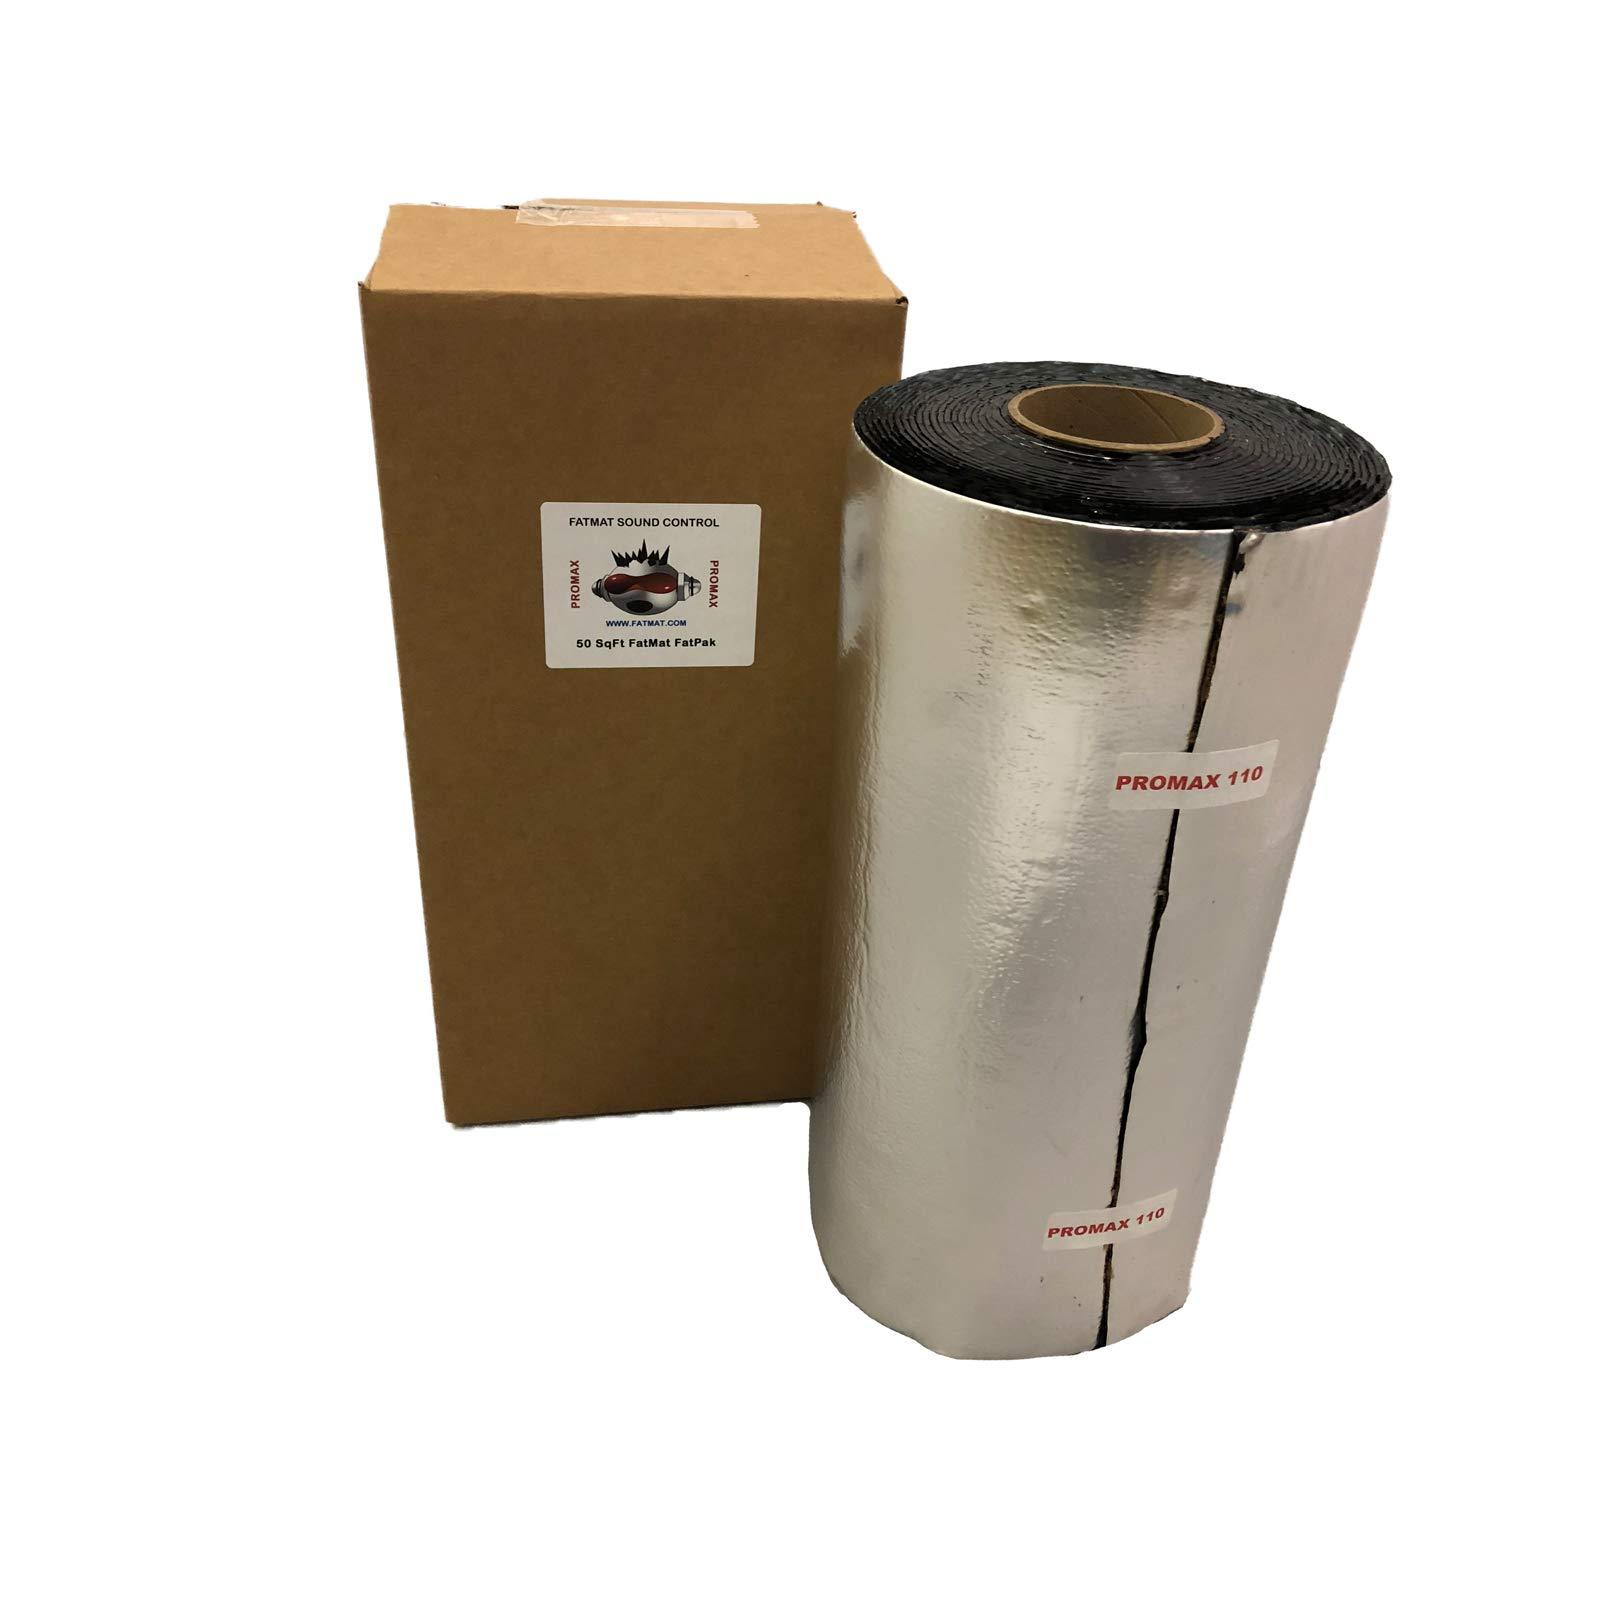 FatMat ProMax 110mil Self-Adhesive Sound Deadener with Install Kit (50 Sq Ft)